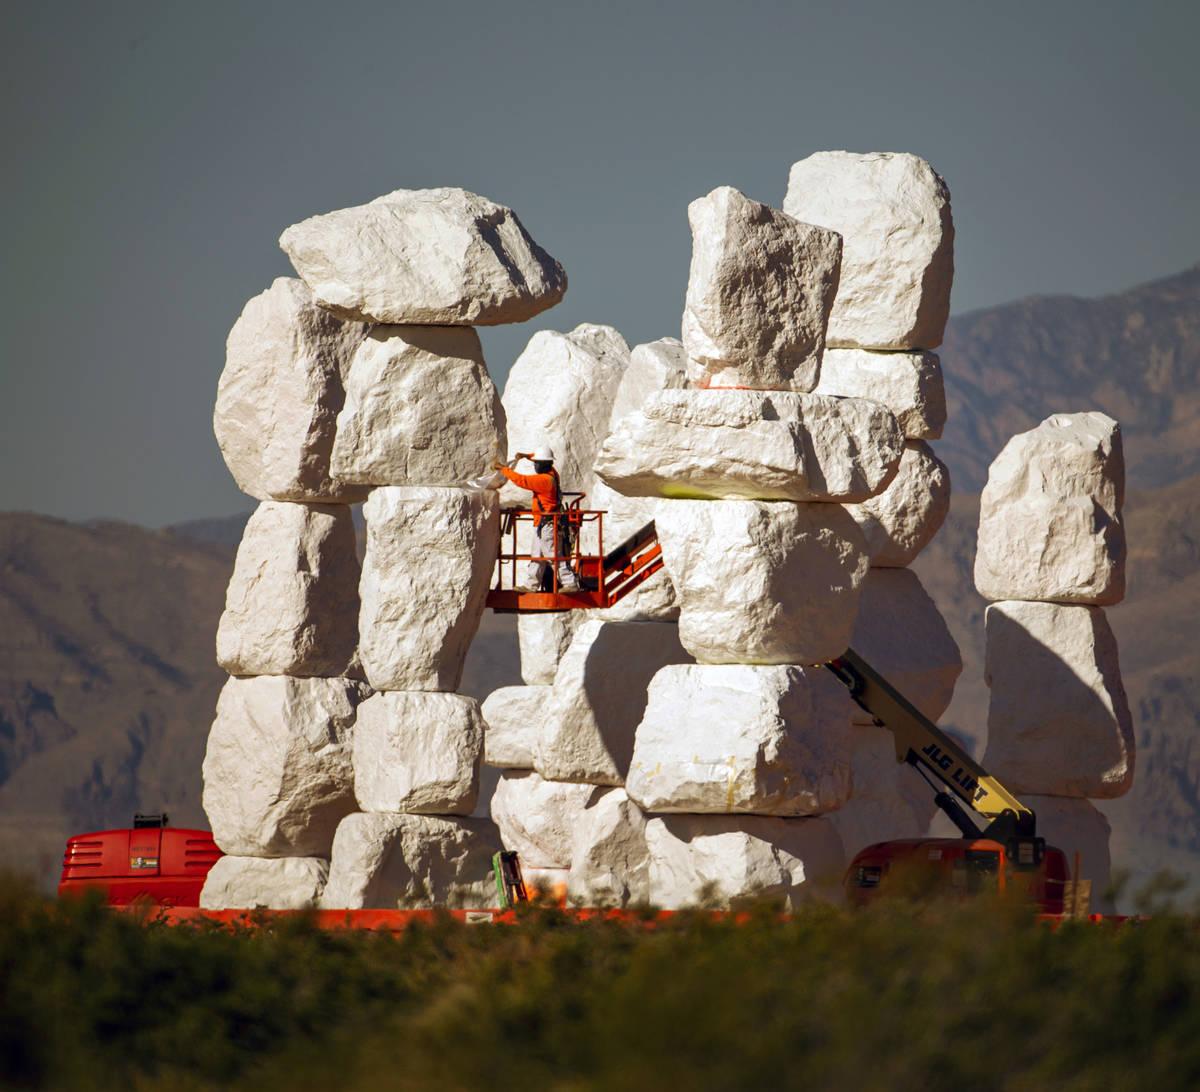 Ivan Ibarra applies primer on June 4. The towers stand 30-35 feet tall. (L.E. Baskow/Las Vegas ...